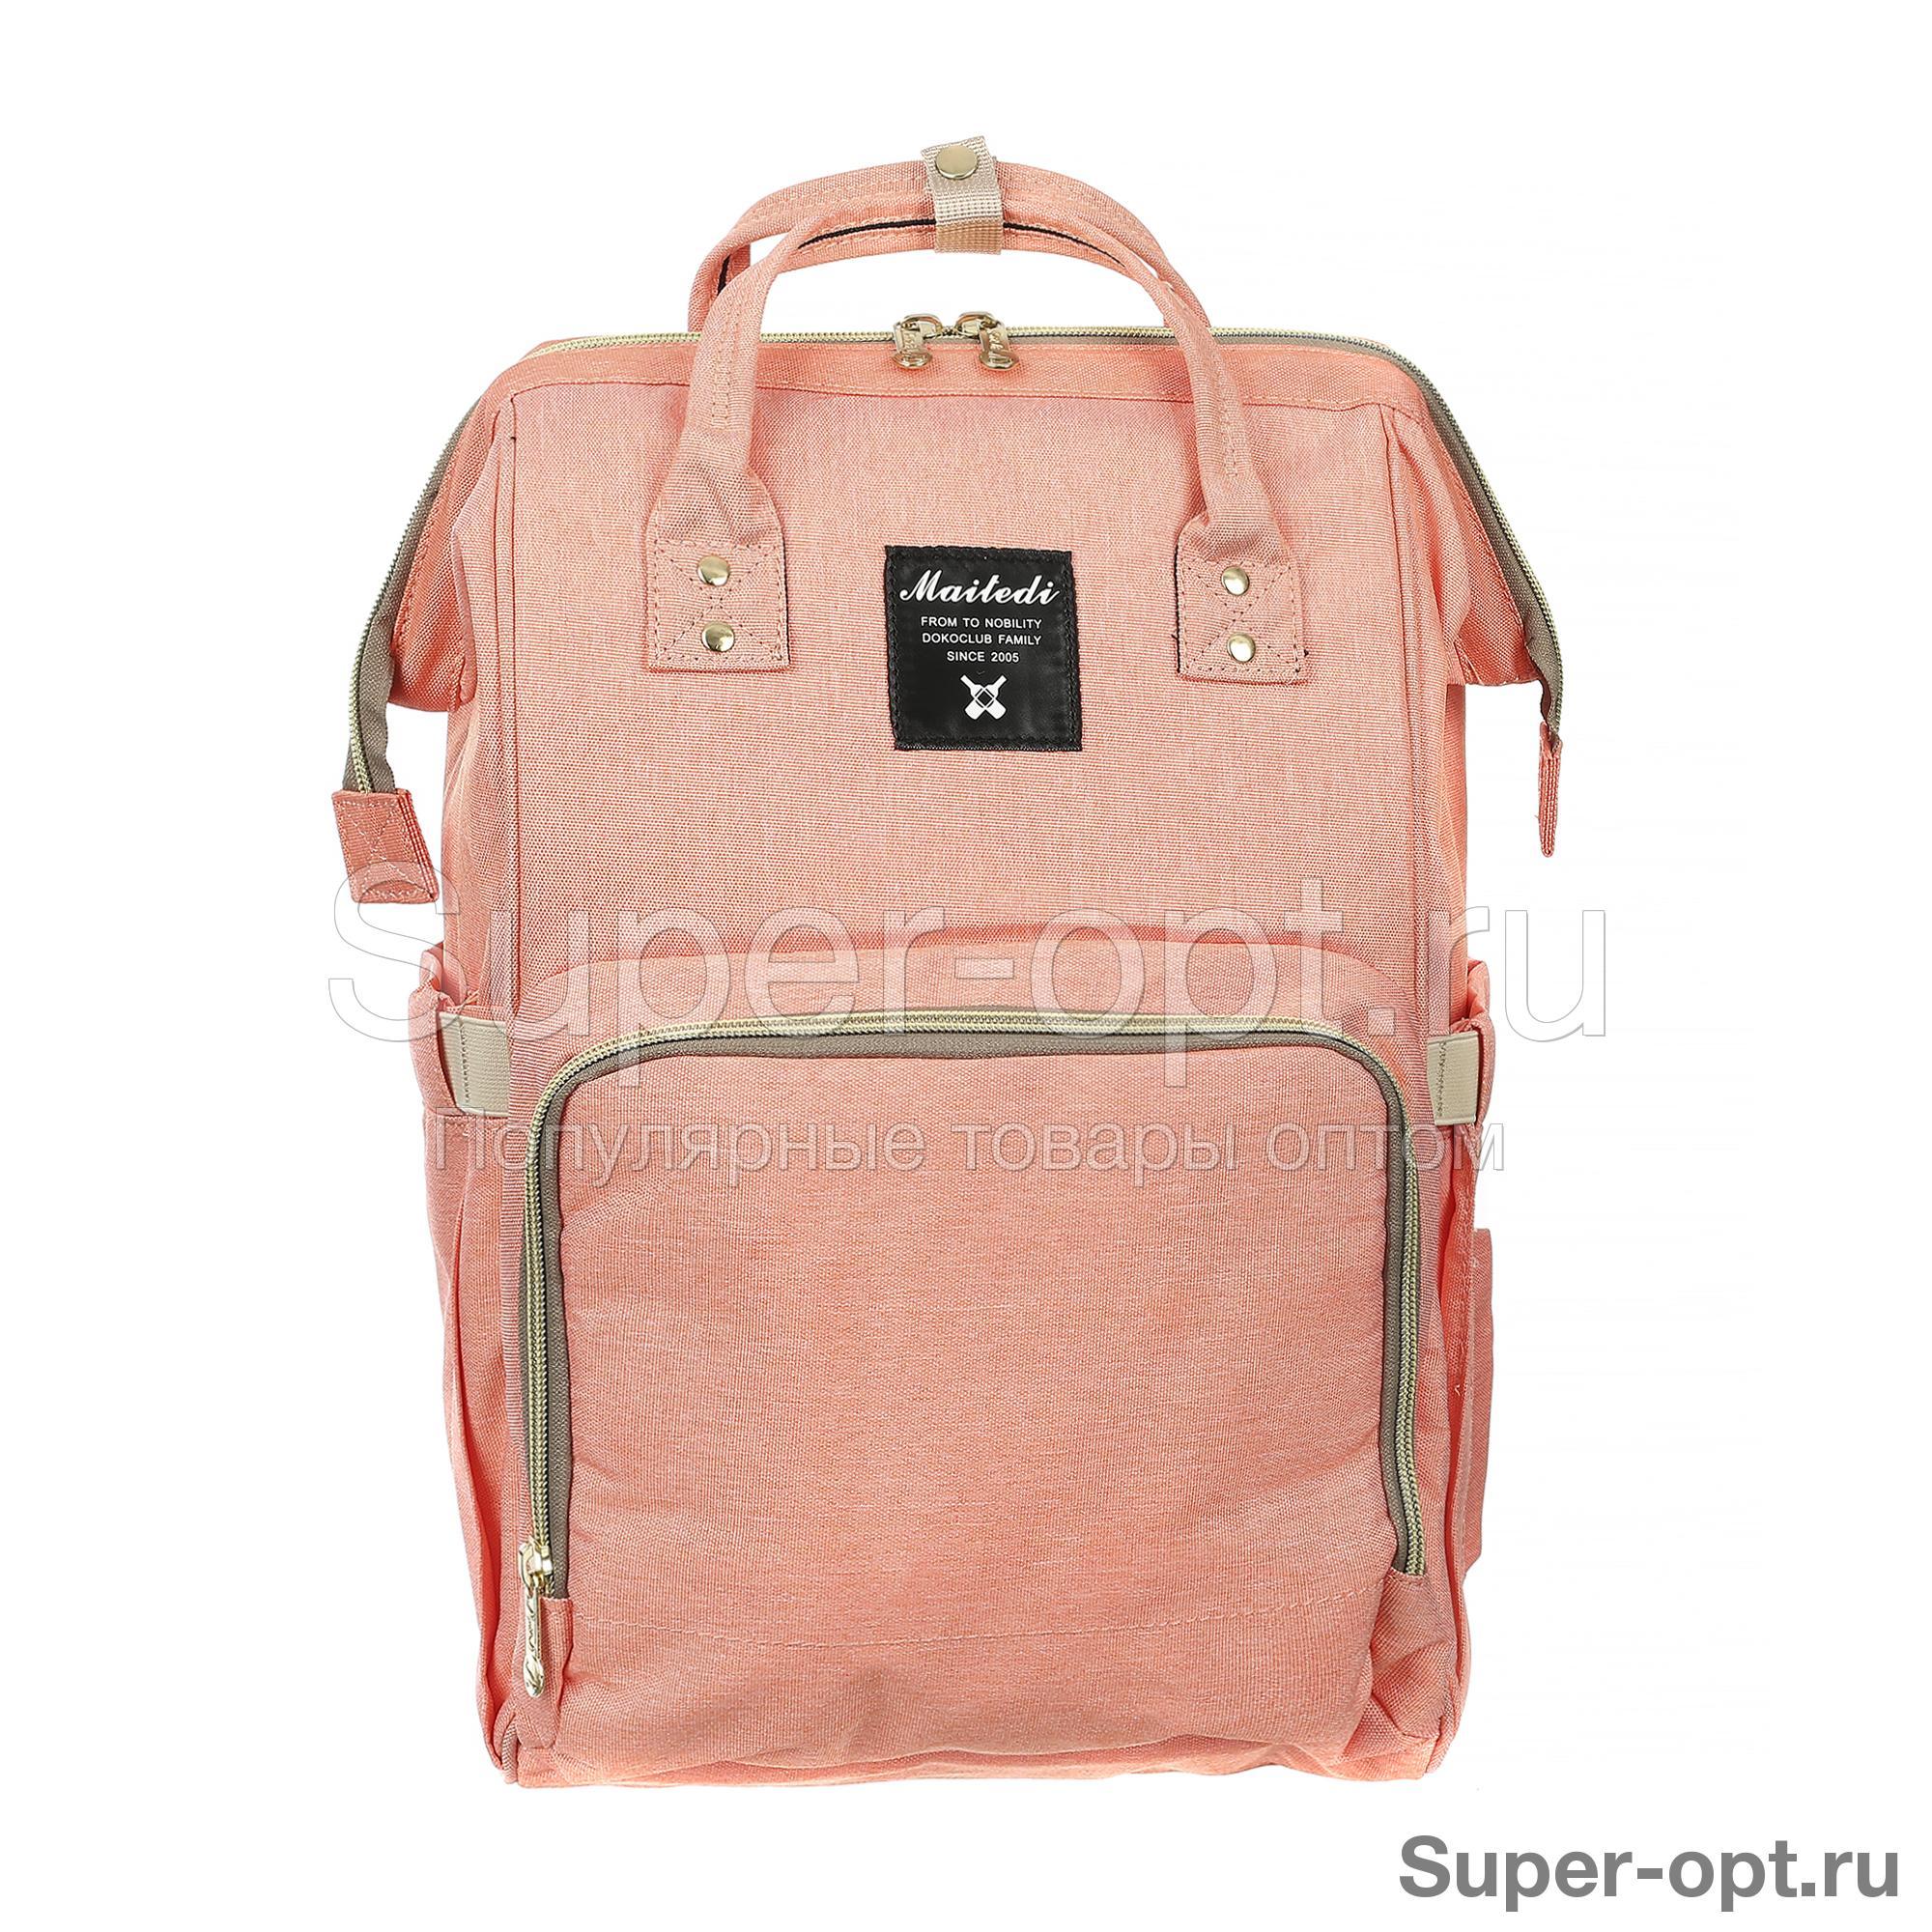 Сумка - рюкзак для мамы Baby Mo оптом